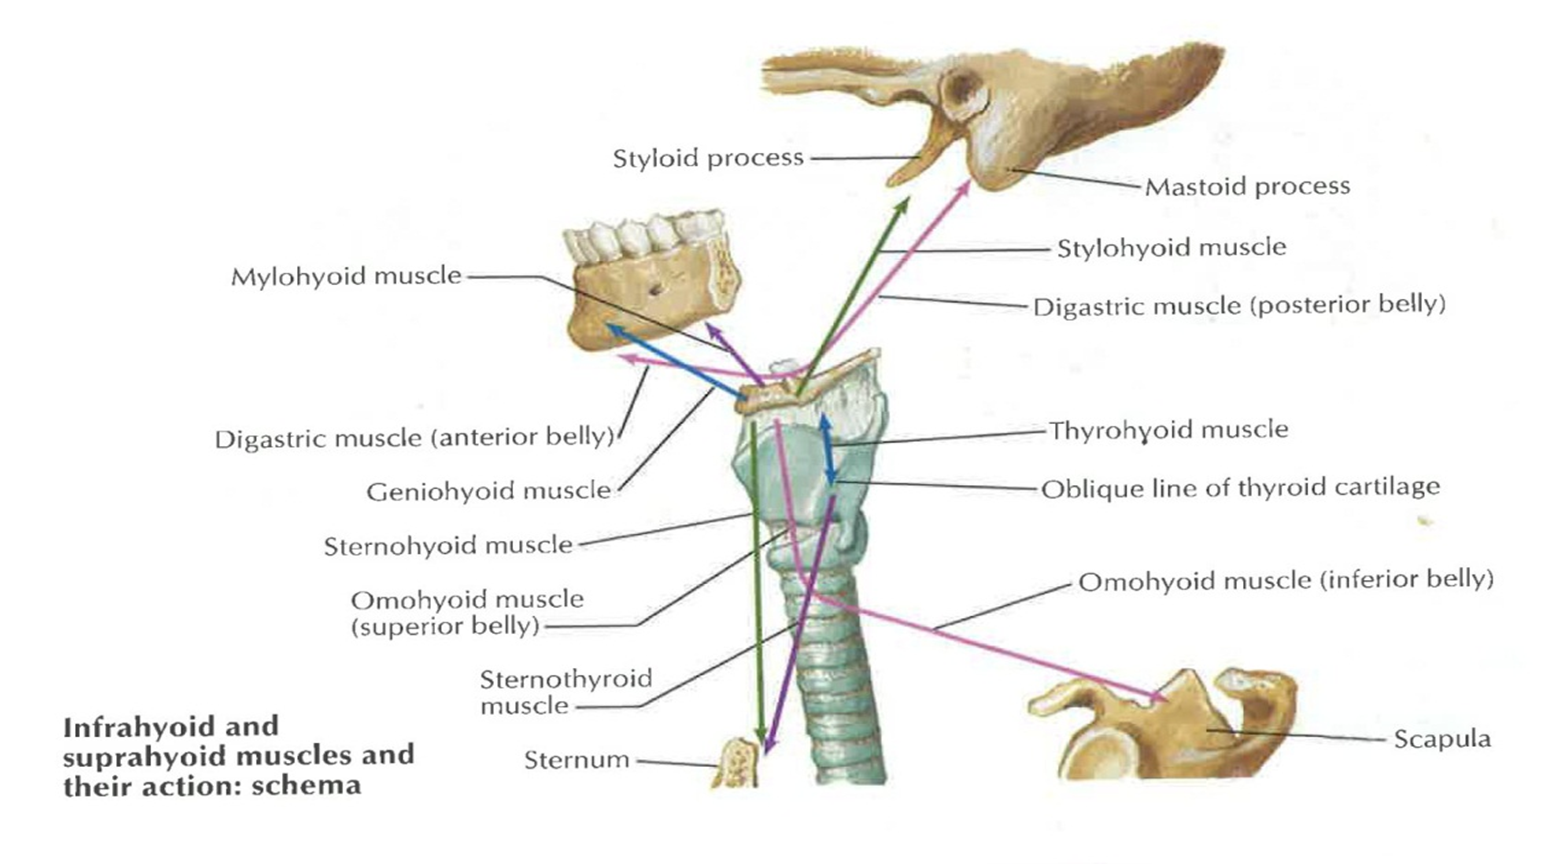 002A - Larynx (Anatomy II) Flashcards | Memorang